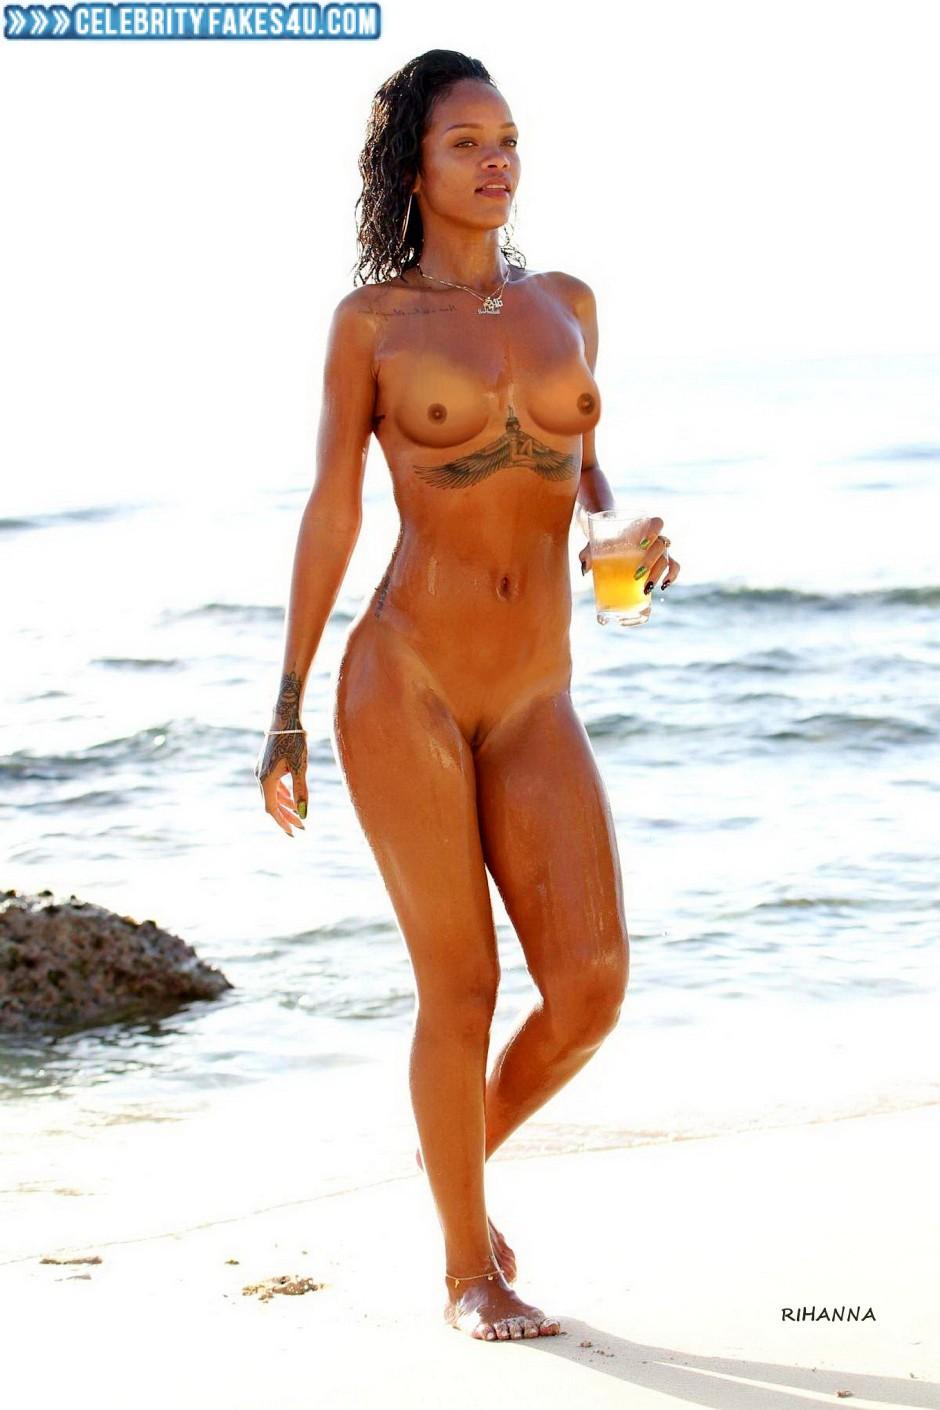 Rihanna Beach Camel Toe Naked Fake 001  Celebrity Fakes 4U-8954